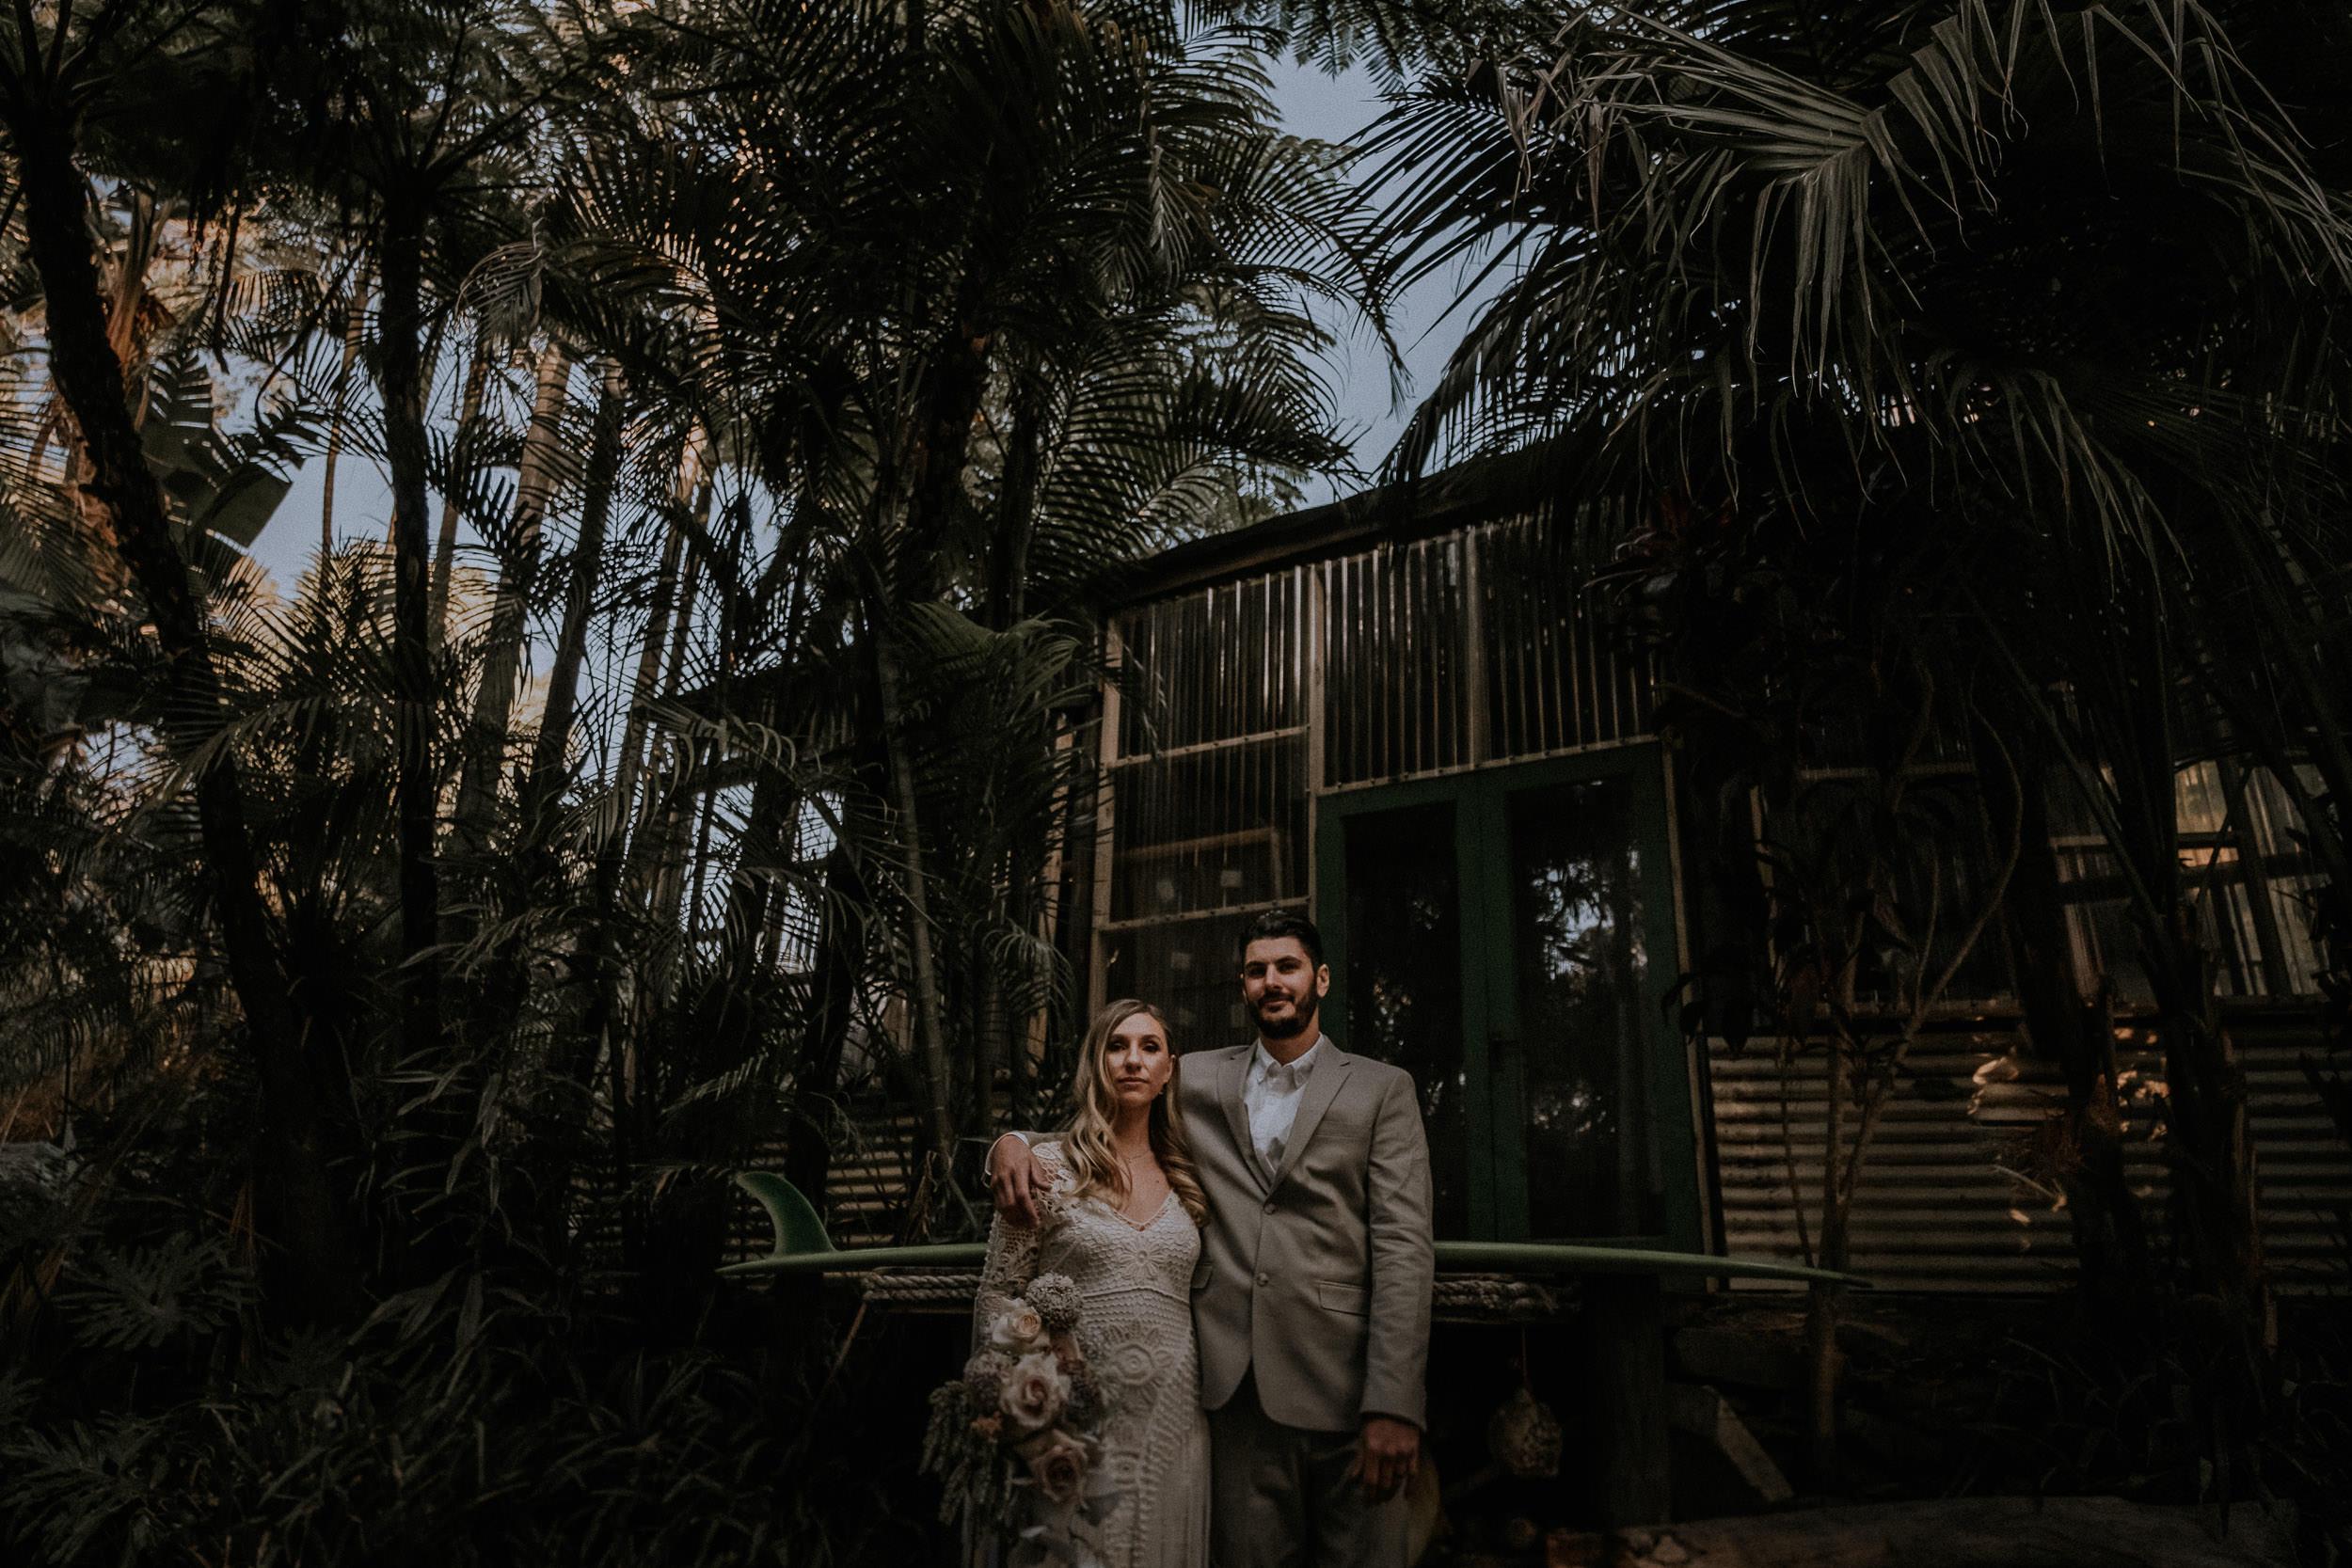 S&A Elopement - Kings & Thieves - Shred 'Til Dead - Central Coast Beach Forest Wedding - 322.jpg